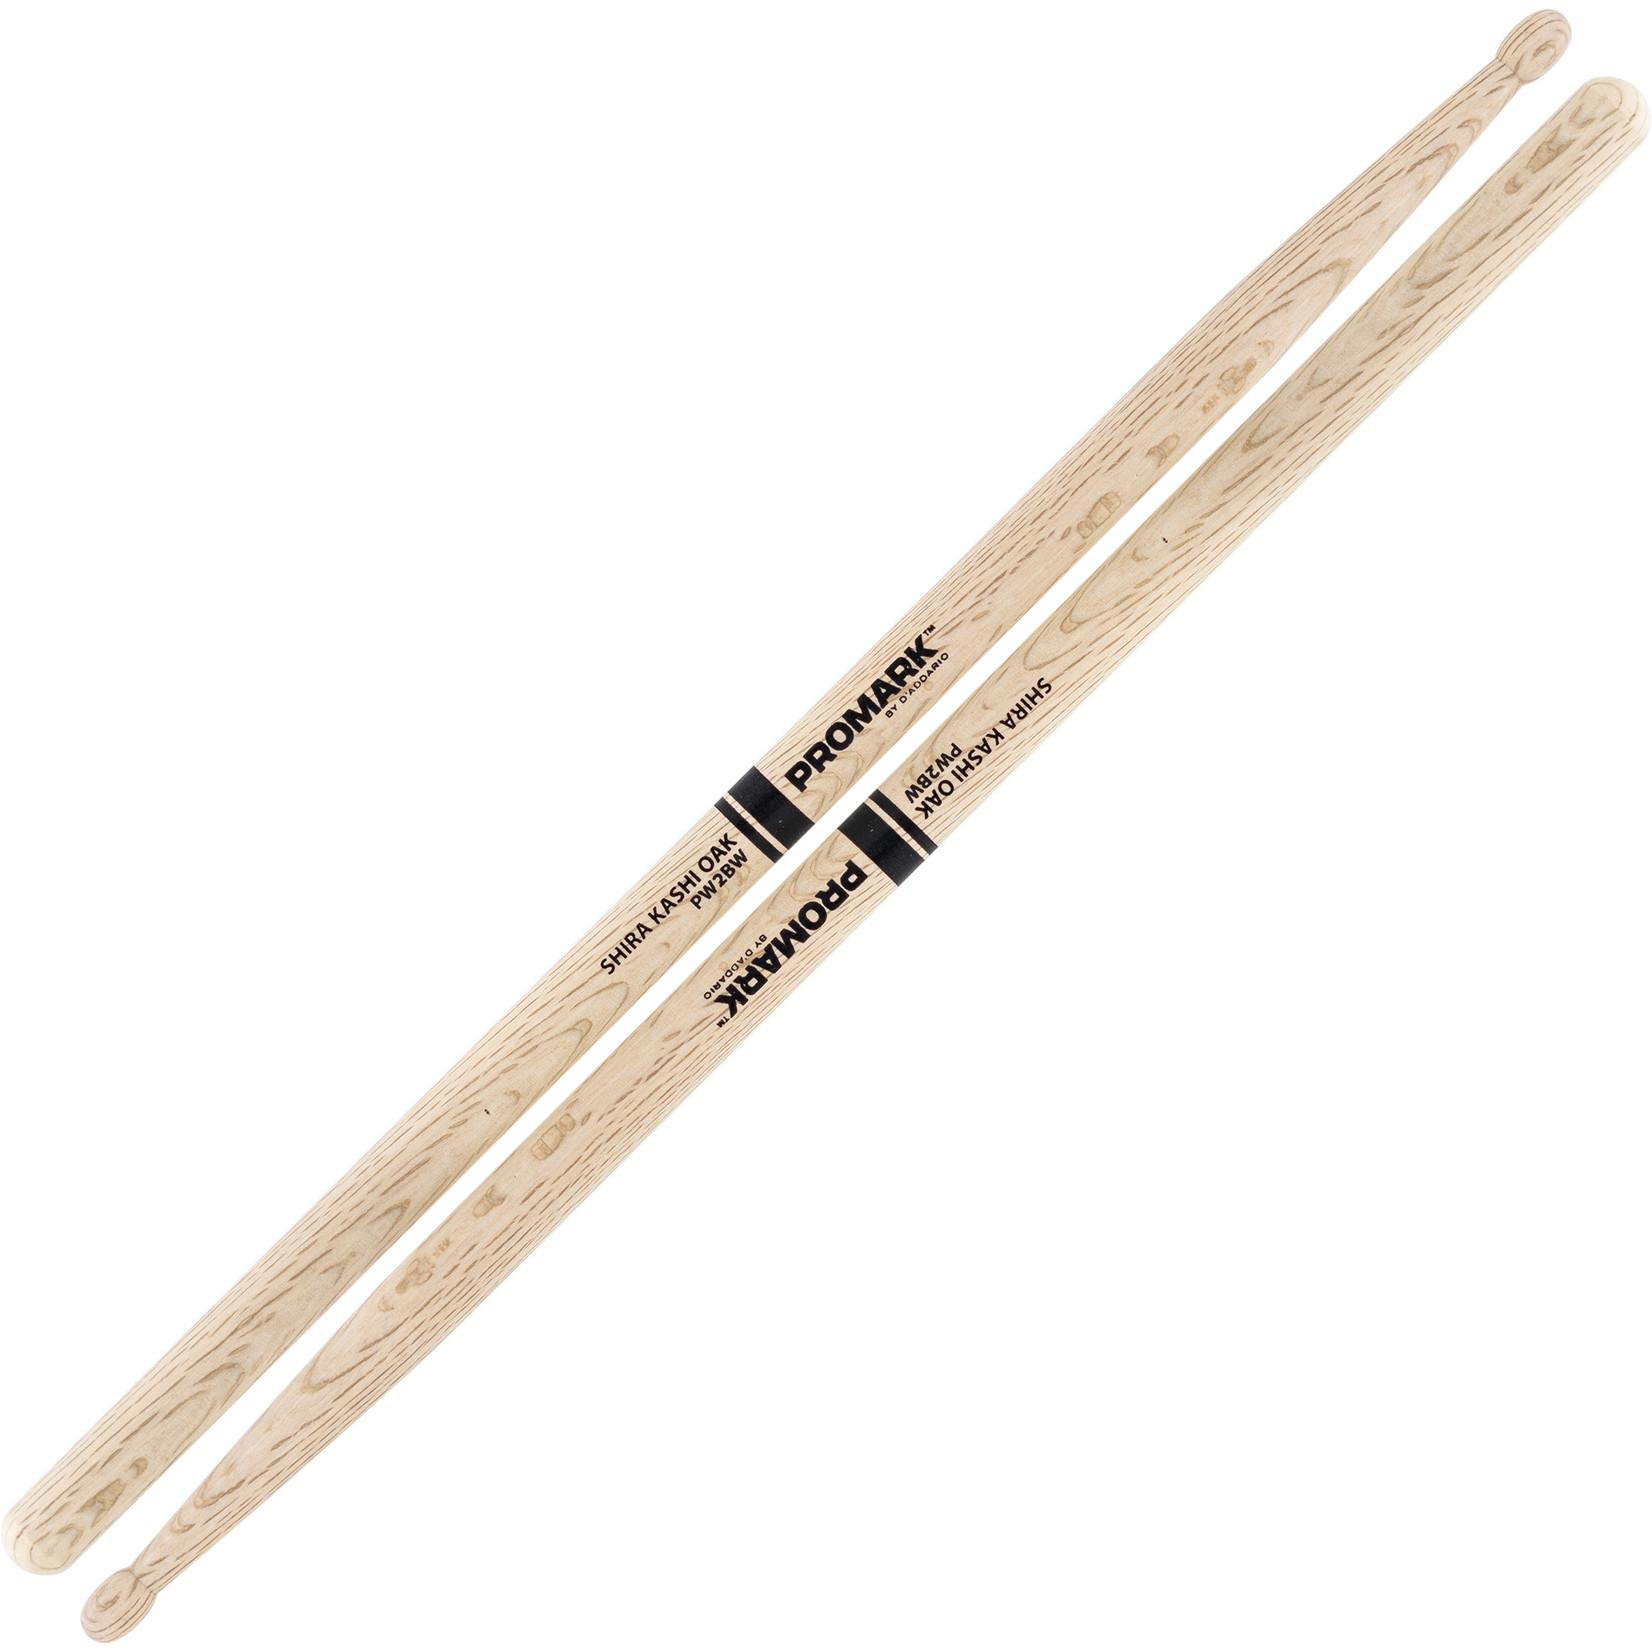 Promark ProMark Classic Shira Kashi Oak Attack 2B Wood Tip Drumstick